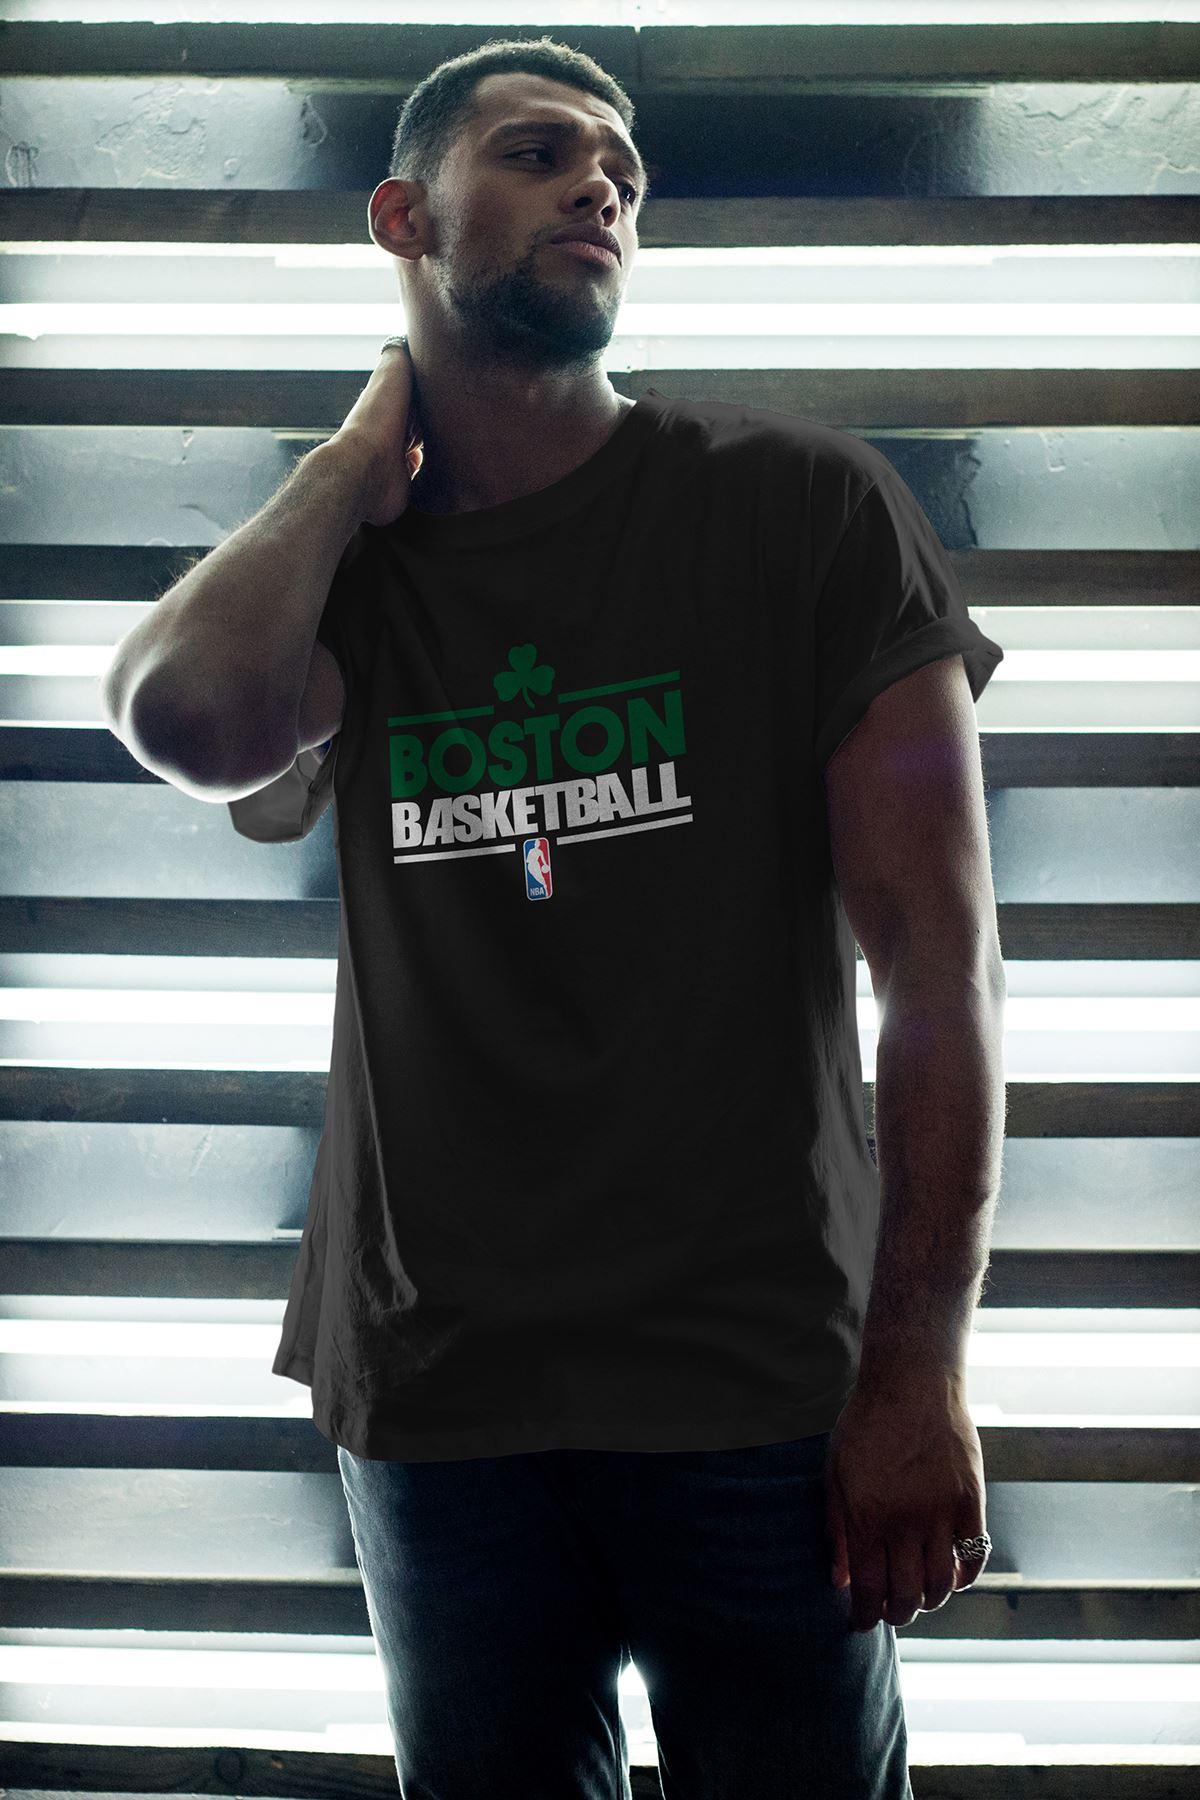 Boston Celtics 34 Siyah Erkek Oversize Tshirt - Tişört